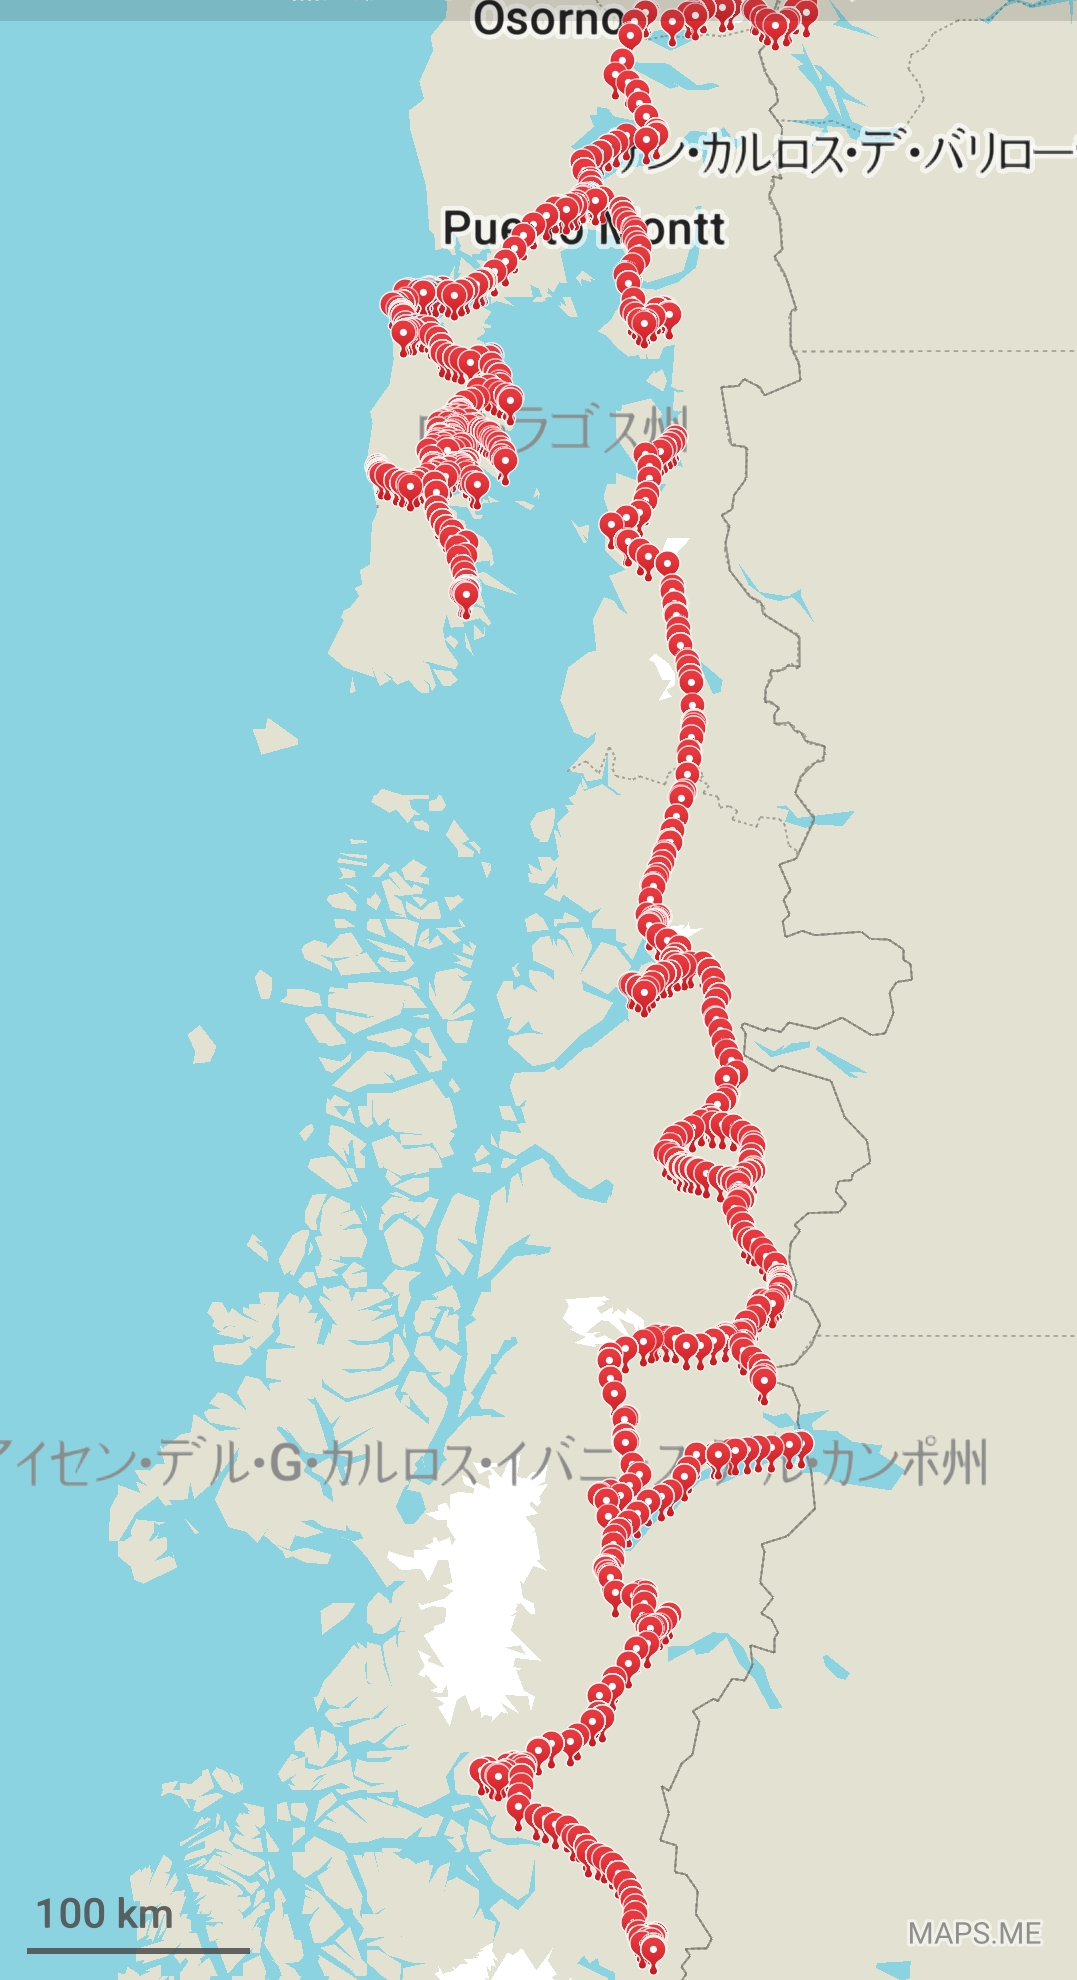 ruta mia de la patagonia